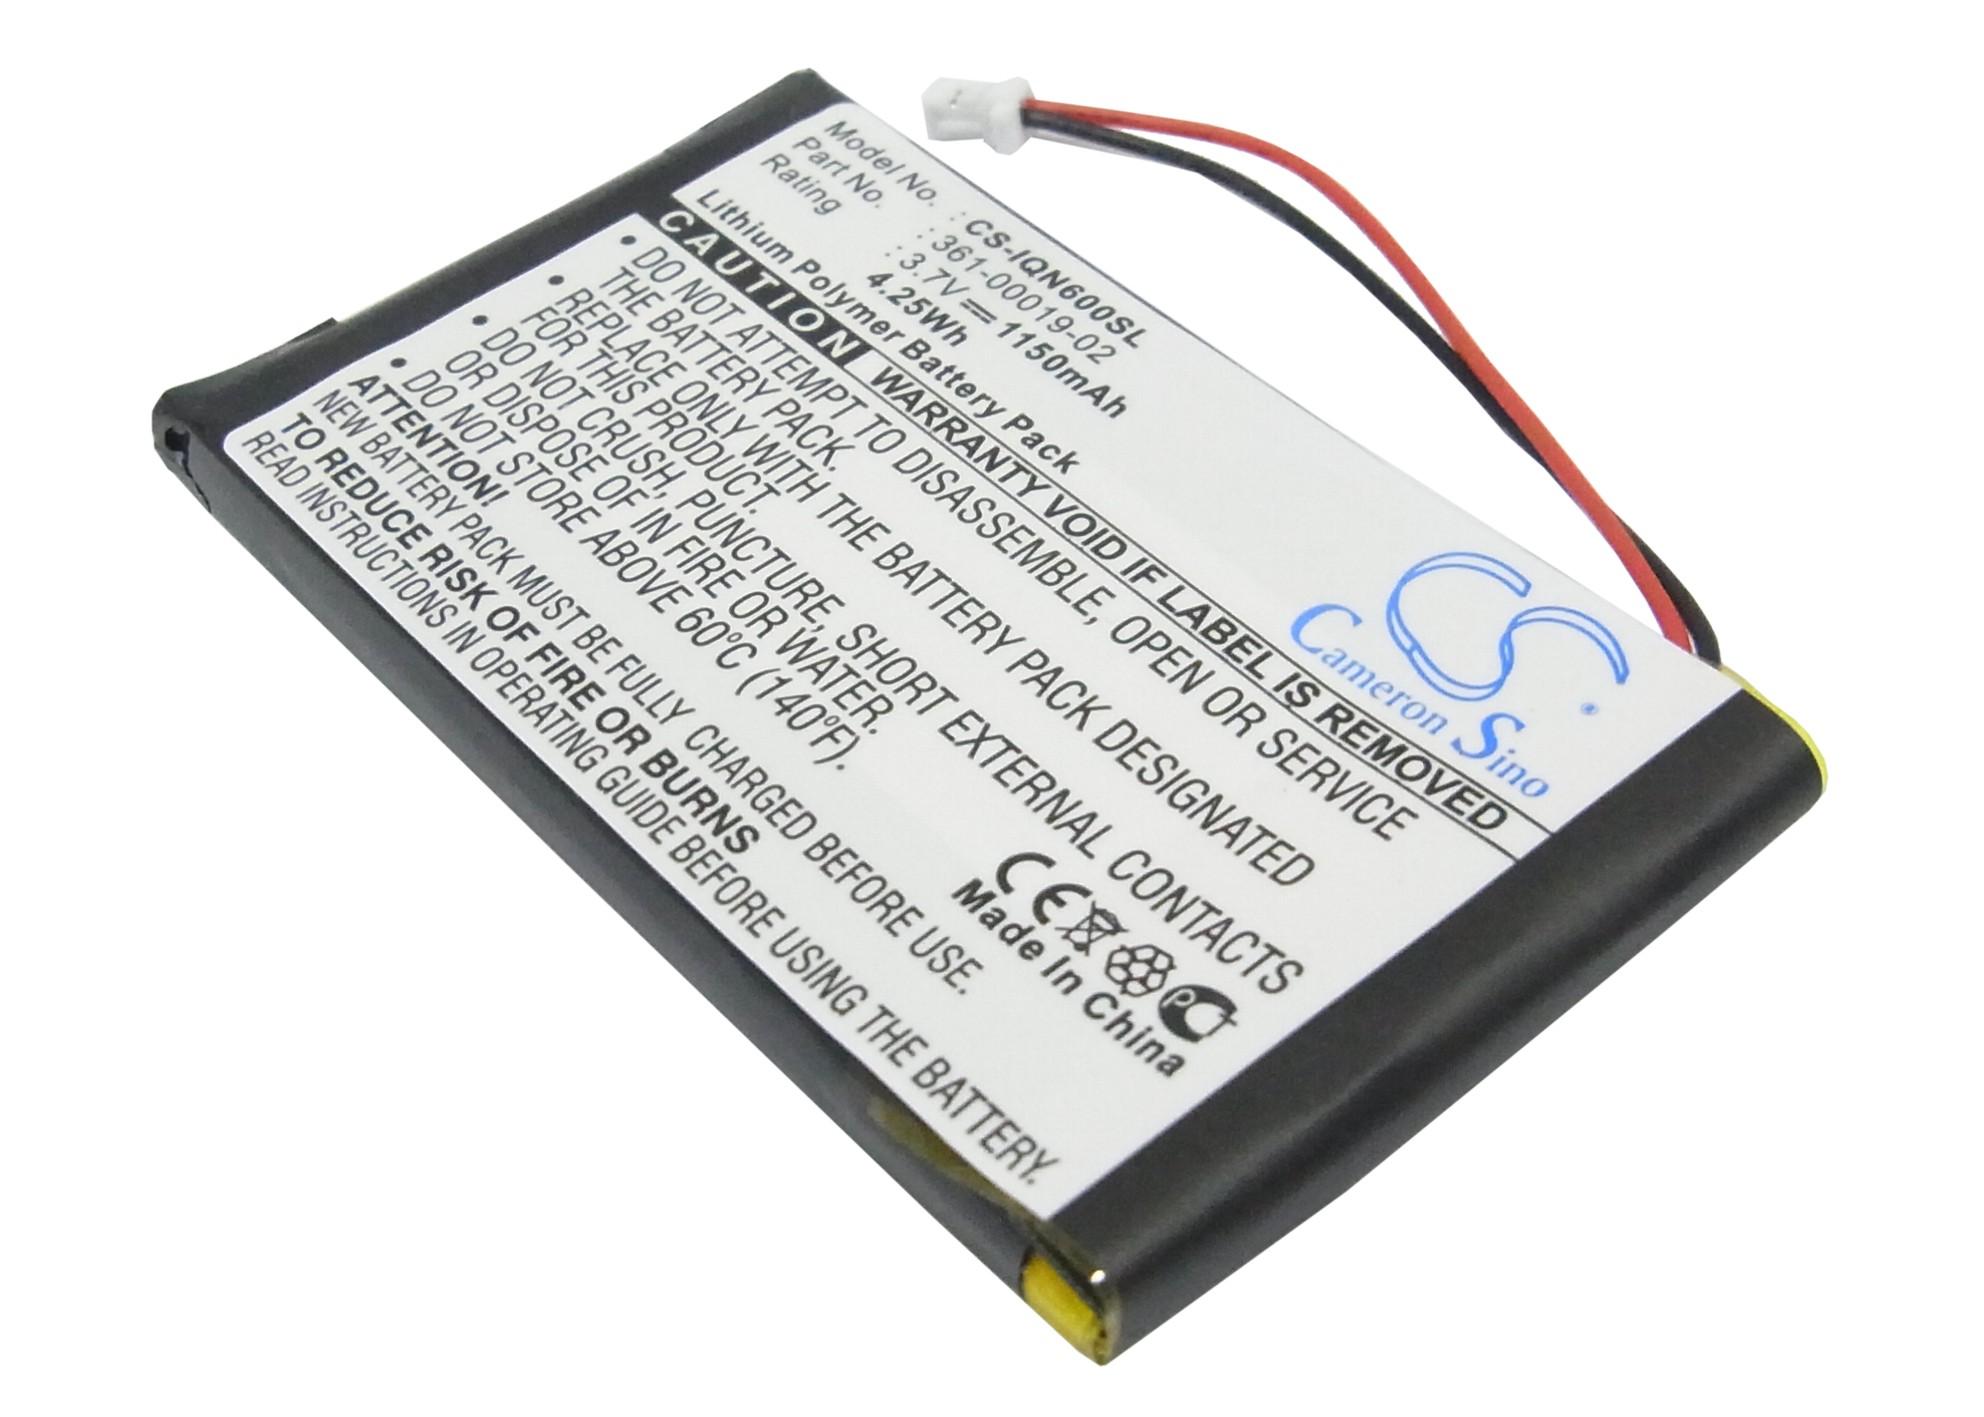 Cameron Sino baterie do navigací (gps) pro GARMIN Nuvi 670 3.7V Li-Polymer 1150mAh černá - neoriginální